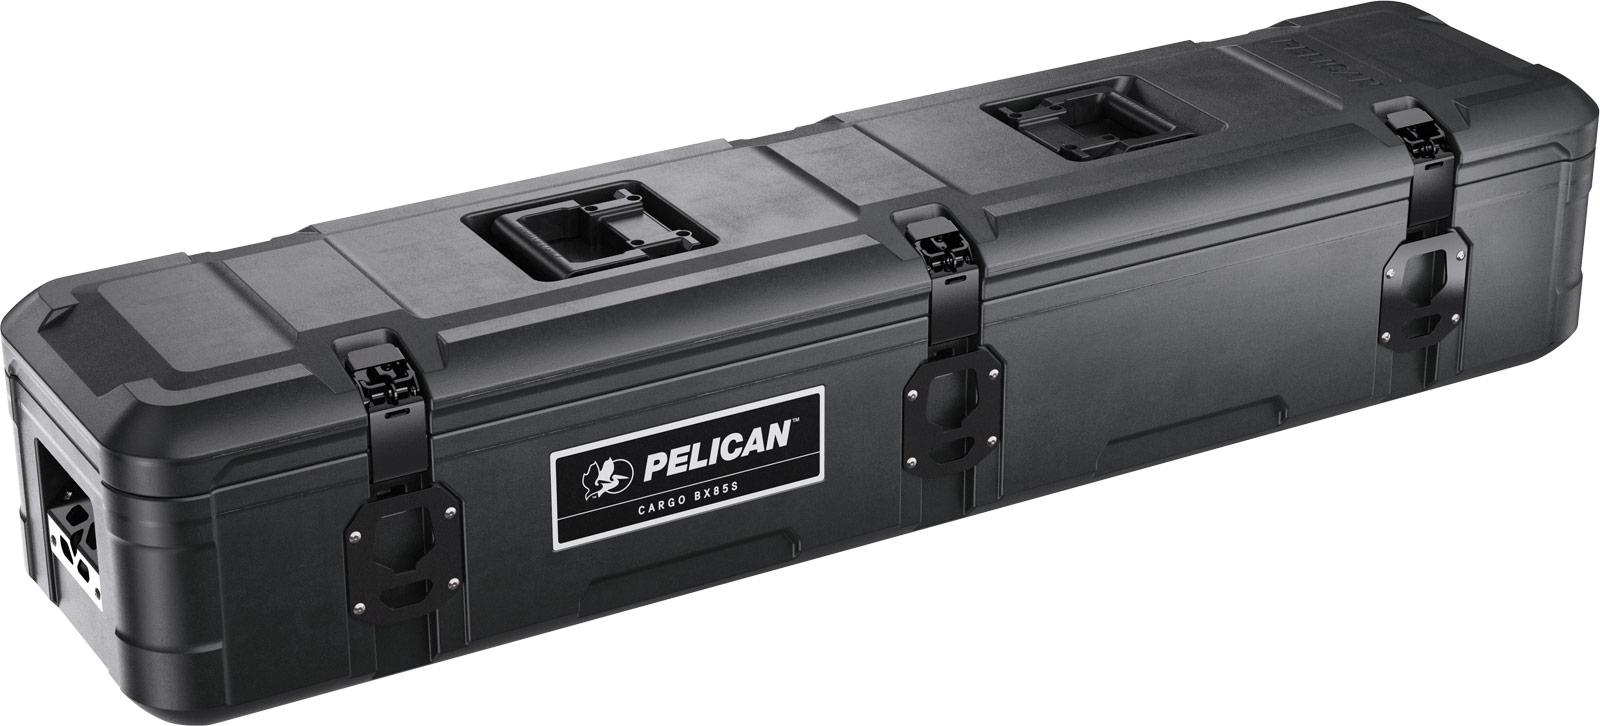 pelican cargo bx85s long trunk case